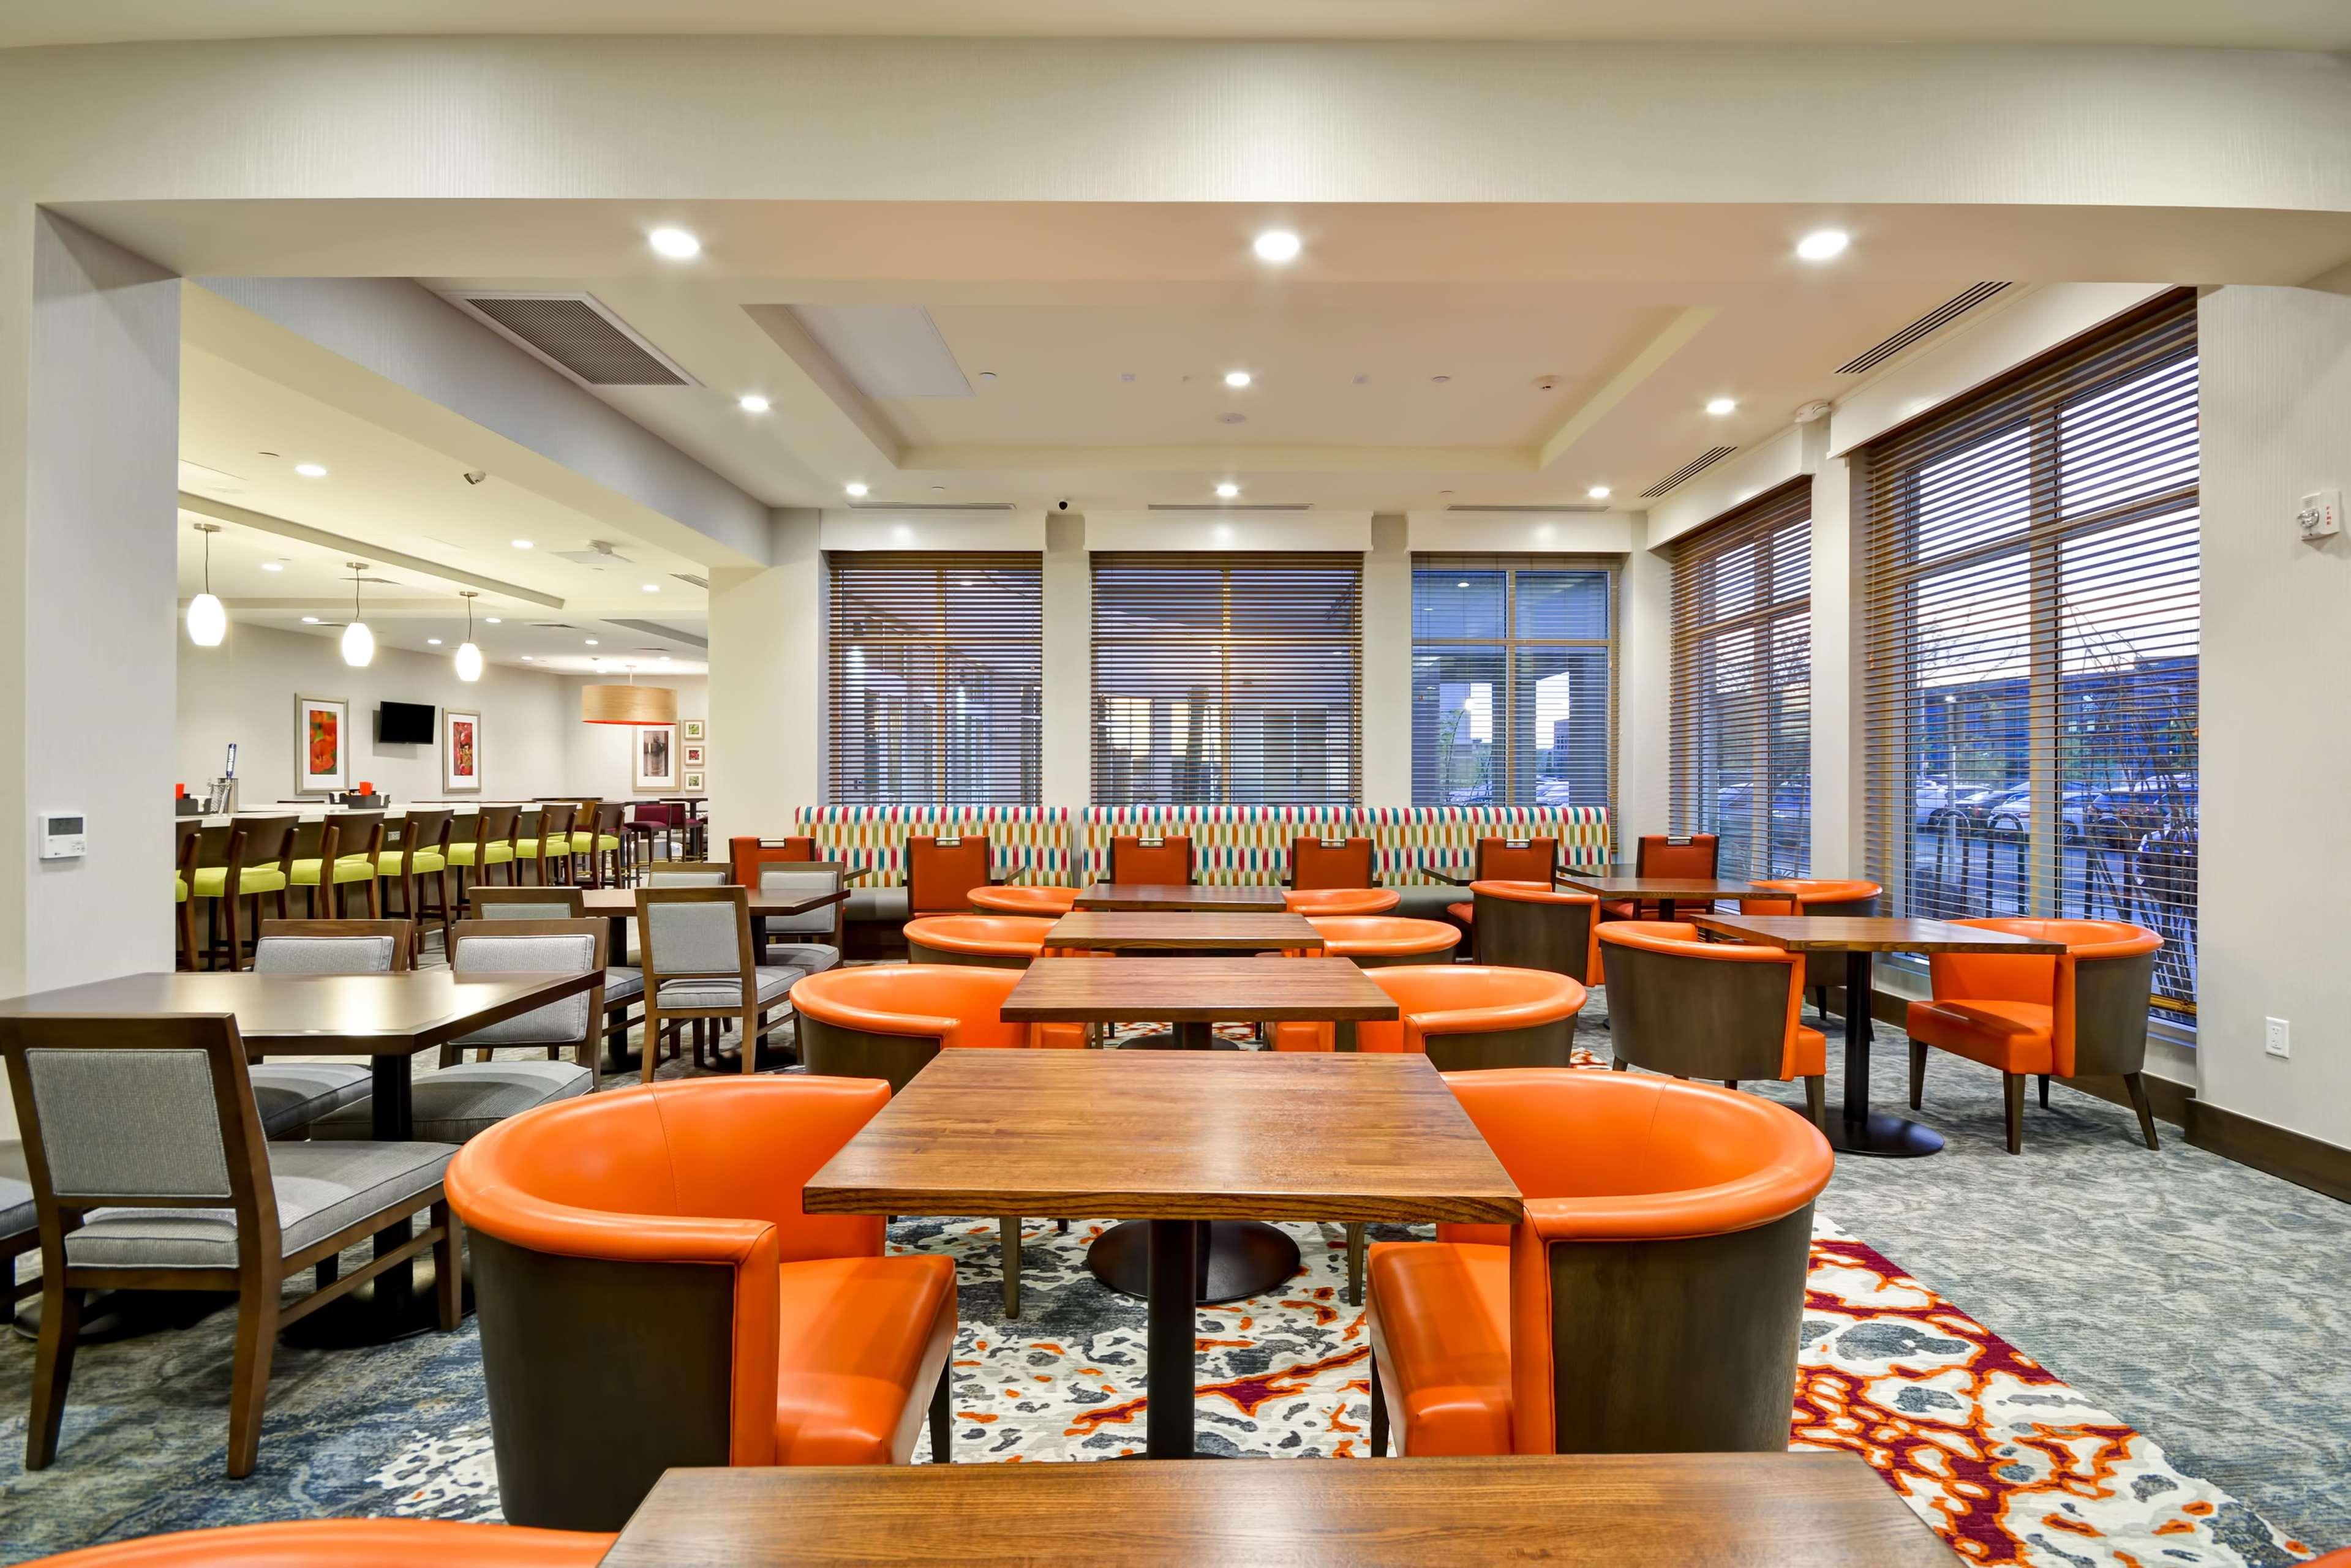 Hilton Garden Inn Phoenix/Tempe ASU Area image 4